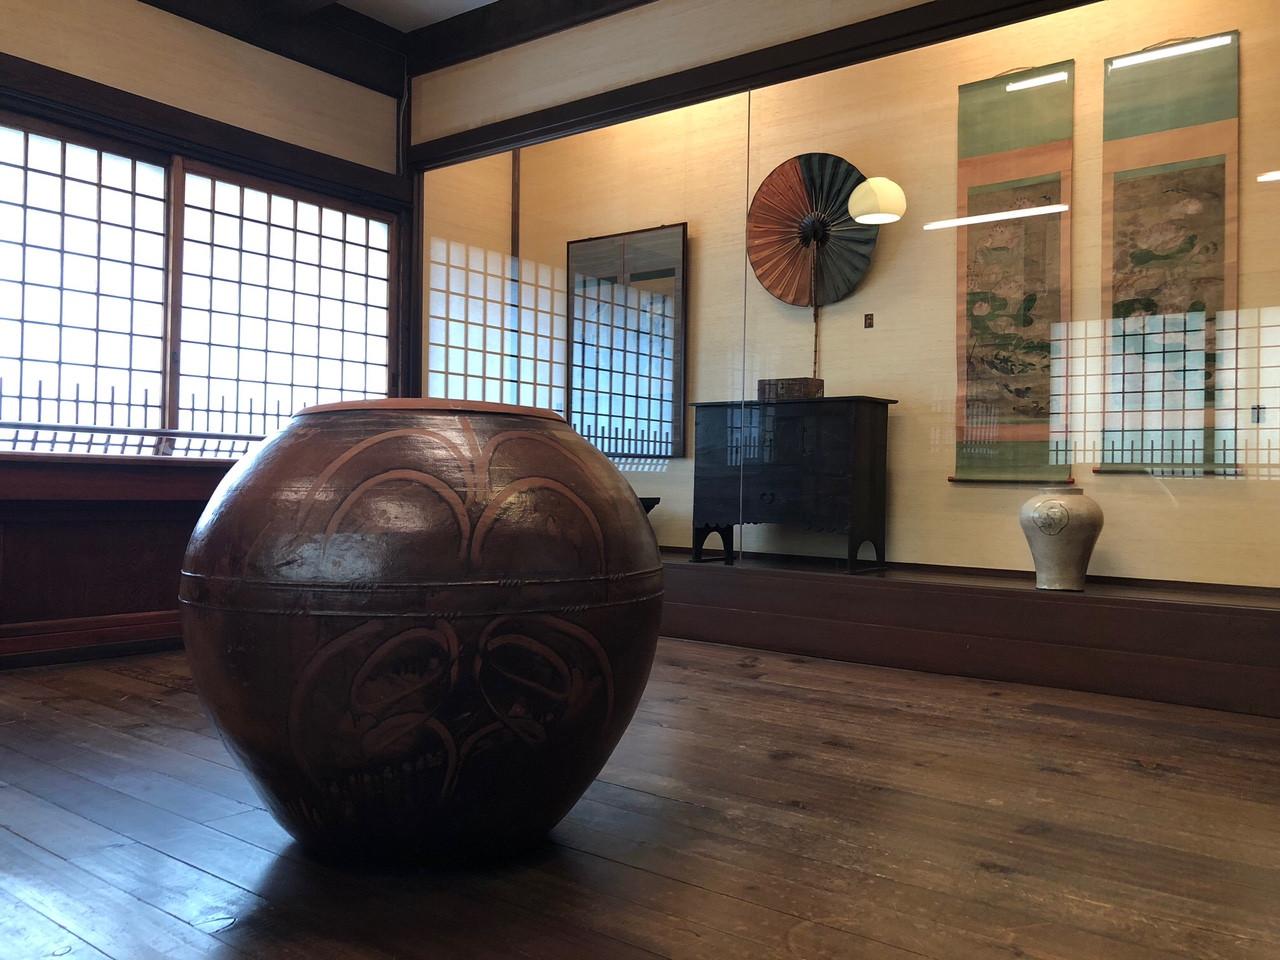 日本民藝館「日本民藝館改修記念 名品展I」朝鮮とその藝術